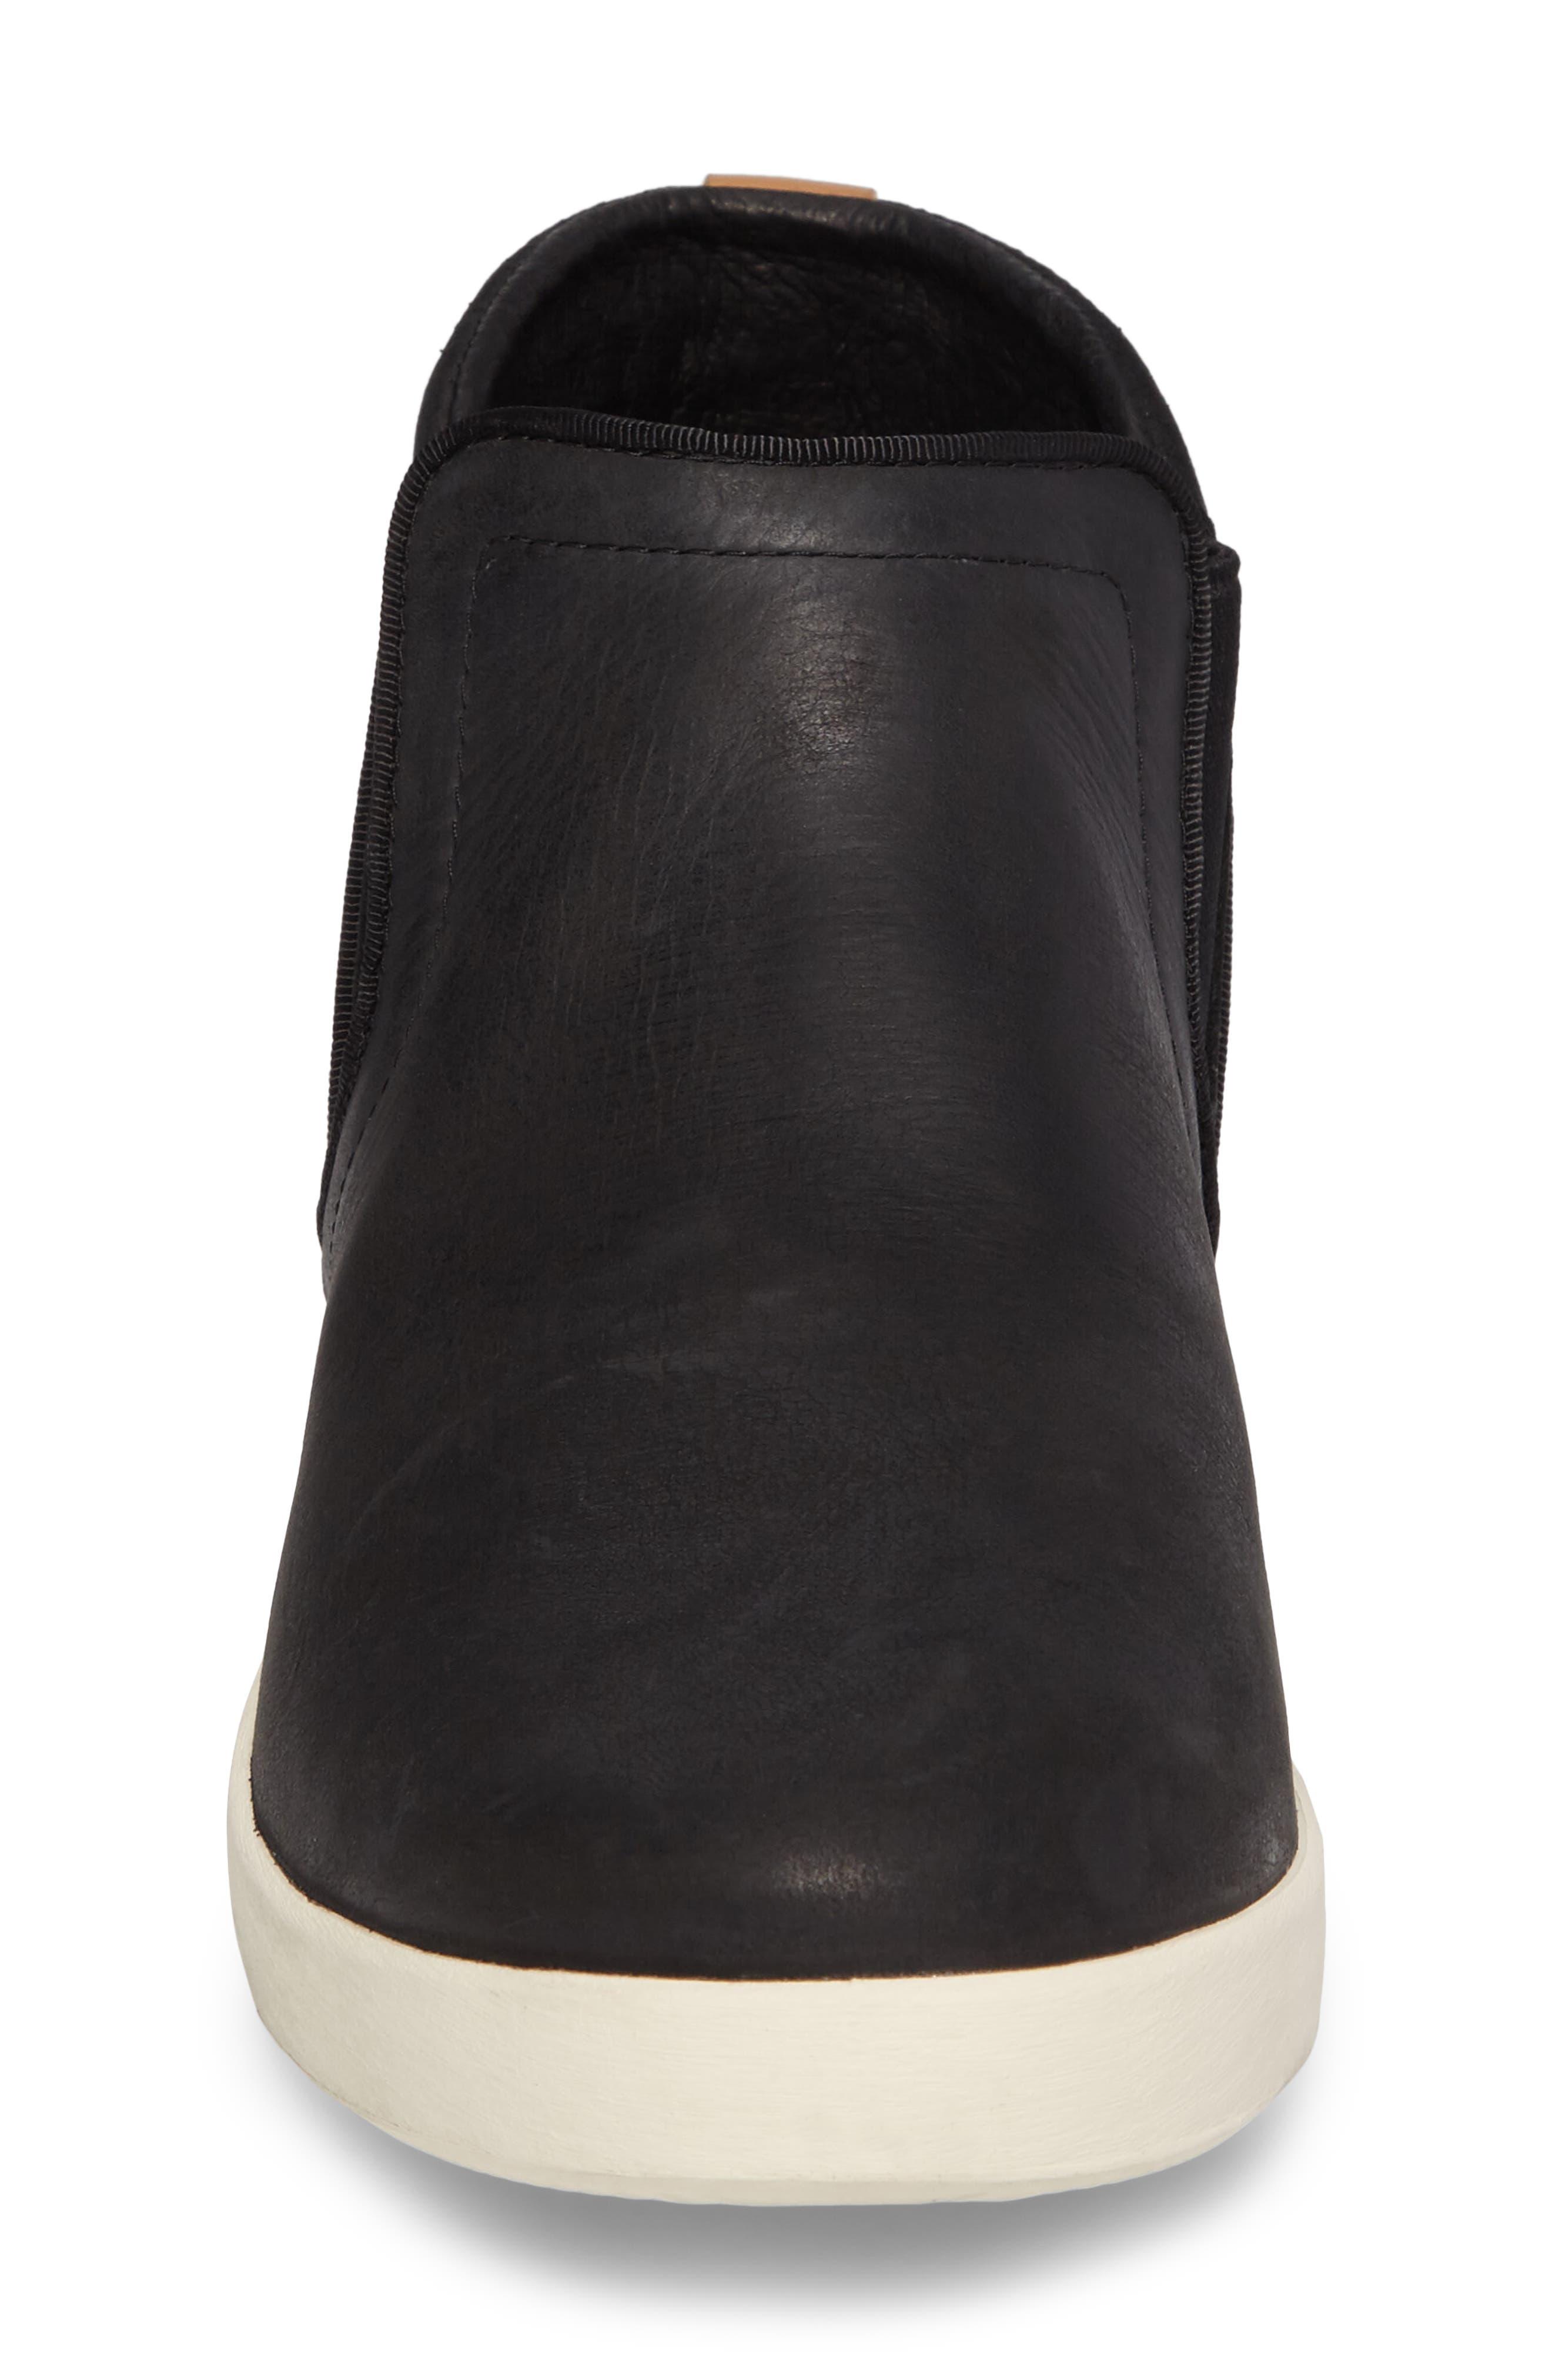 Willow Chelsea Sneaker,                             Alternate thumbnail 4, color,                             Black Leather